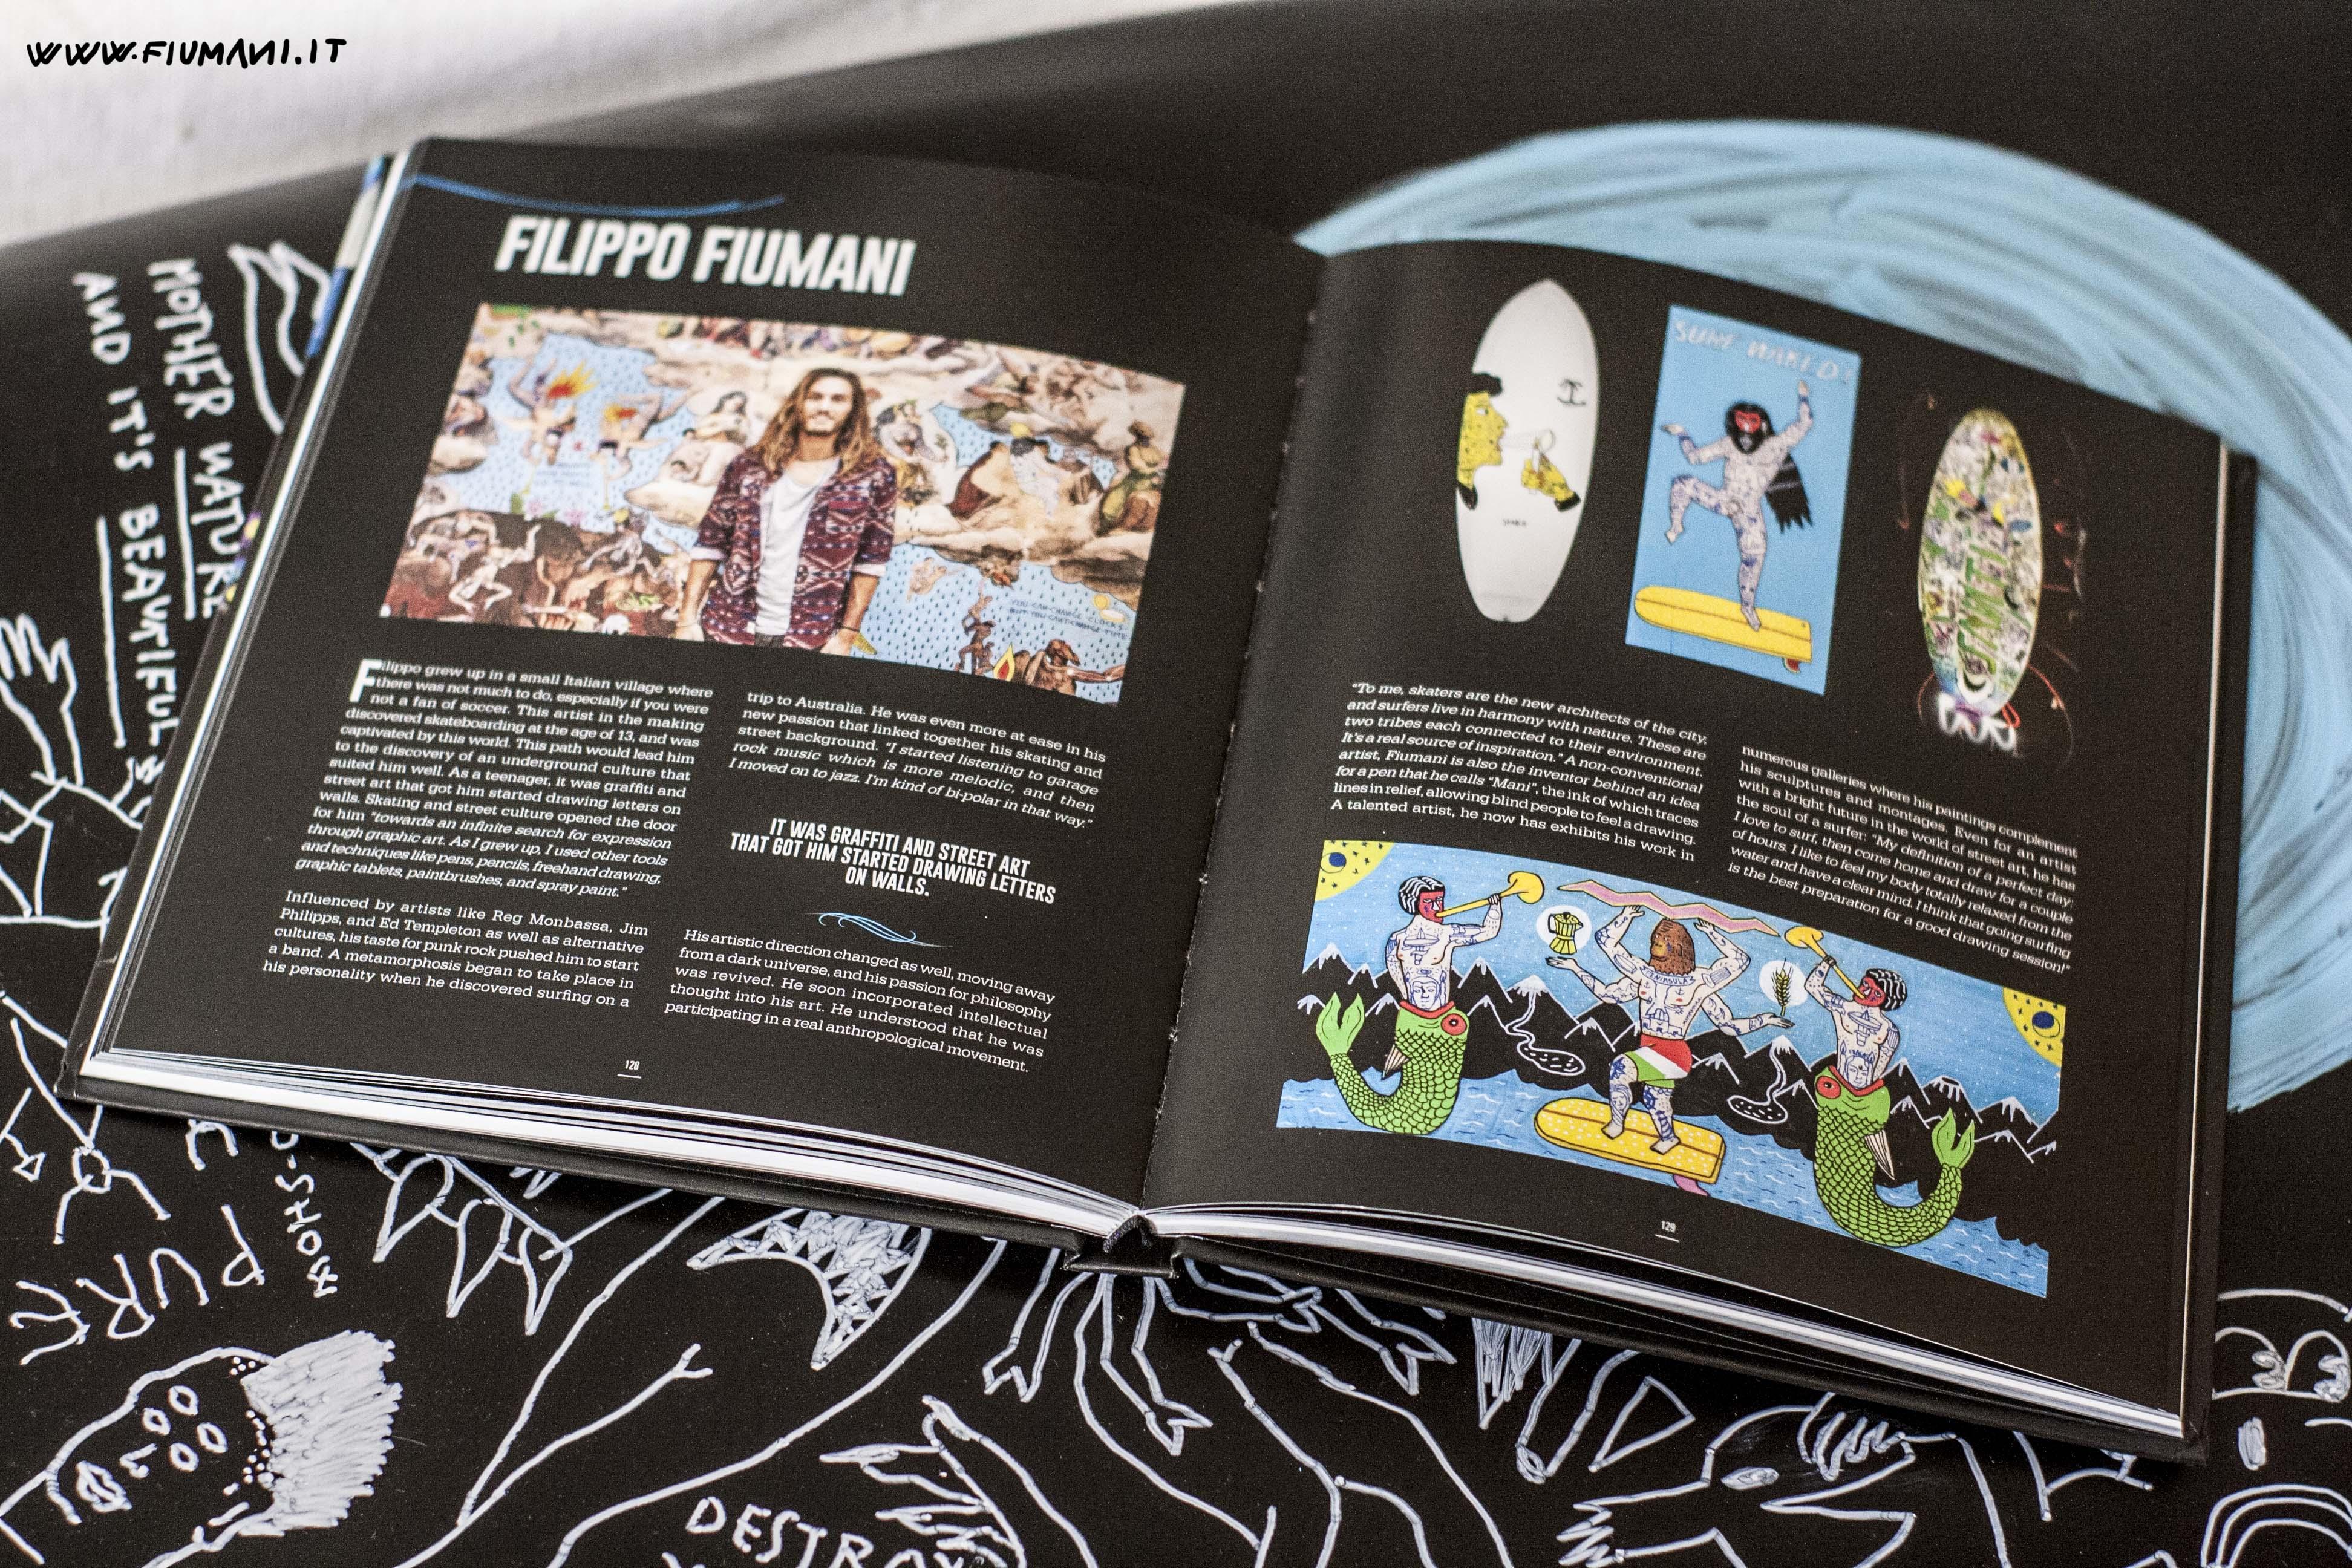 Filippo Fiumani aka MANI | MANI on SURFartwork book by POSCA